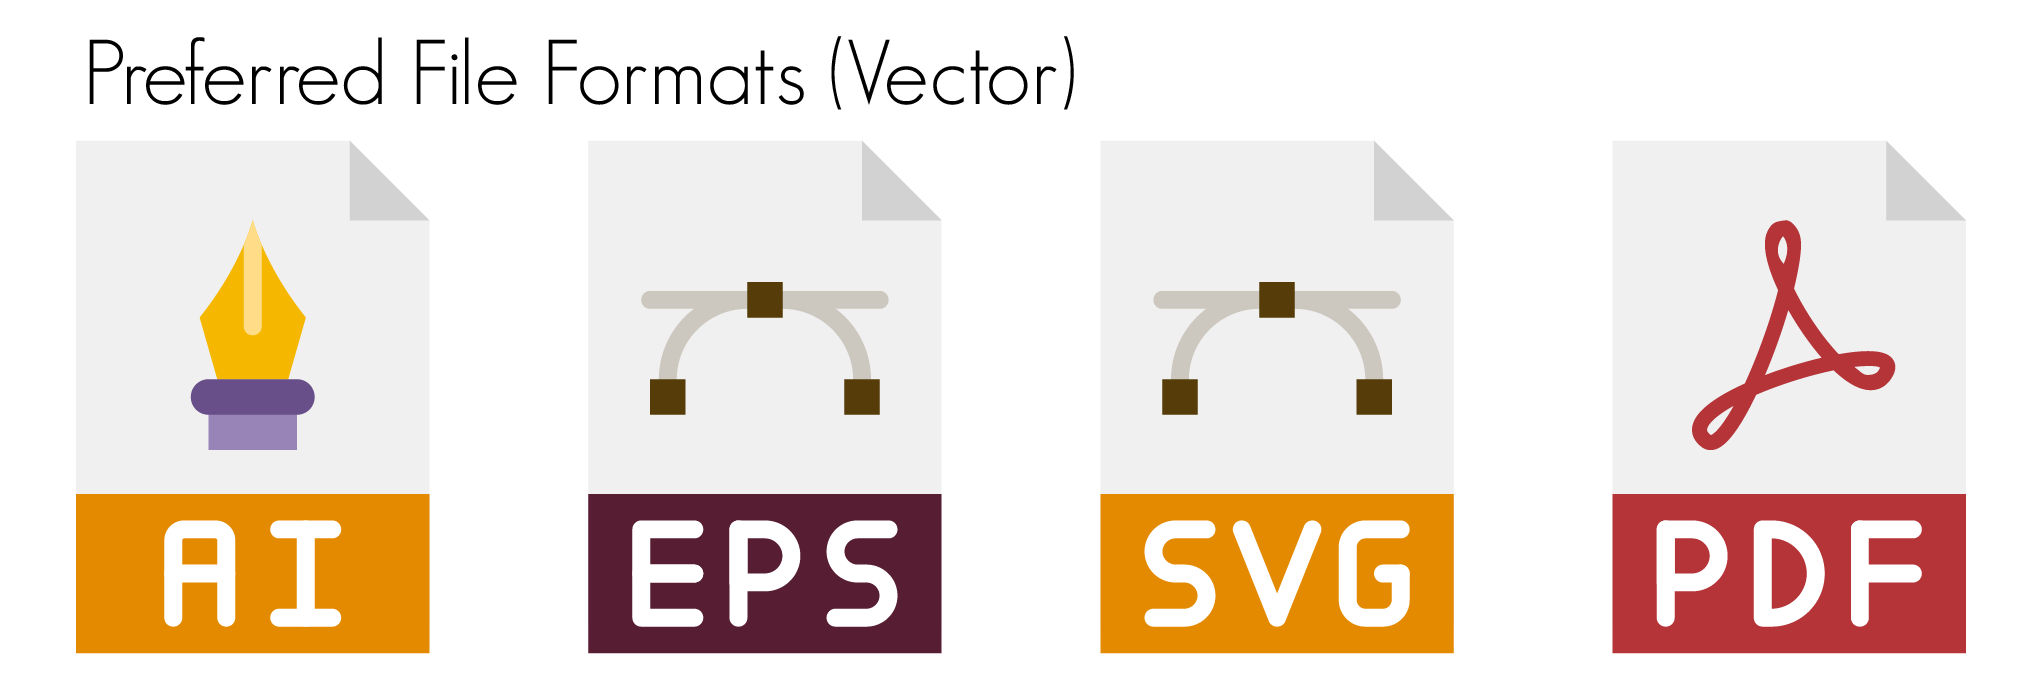 Vector Based File Formats